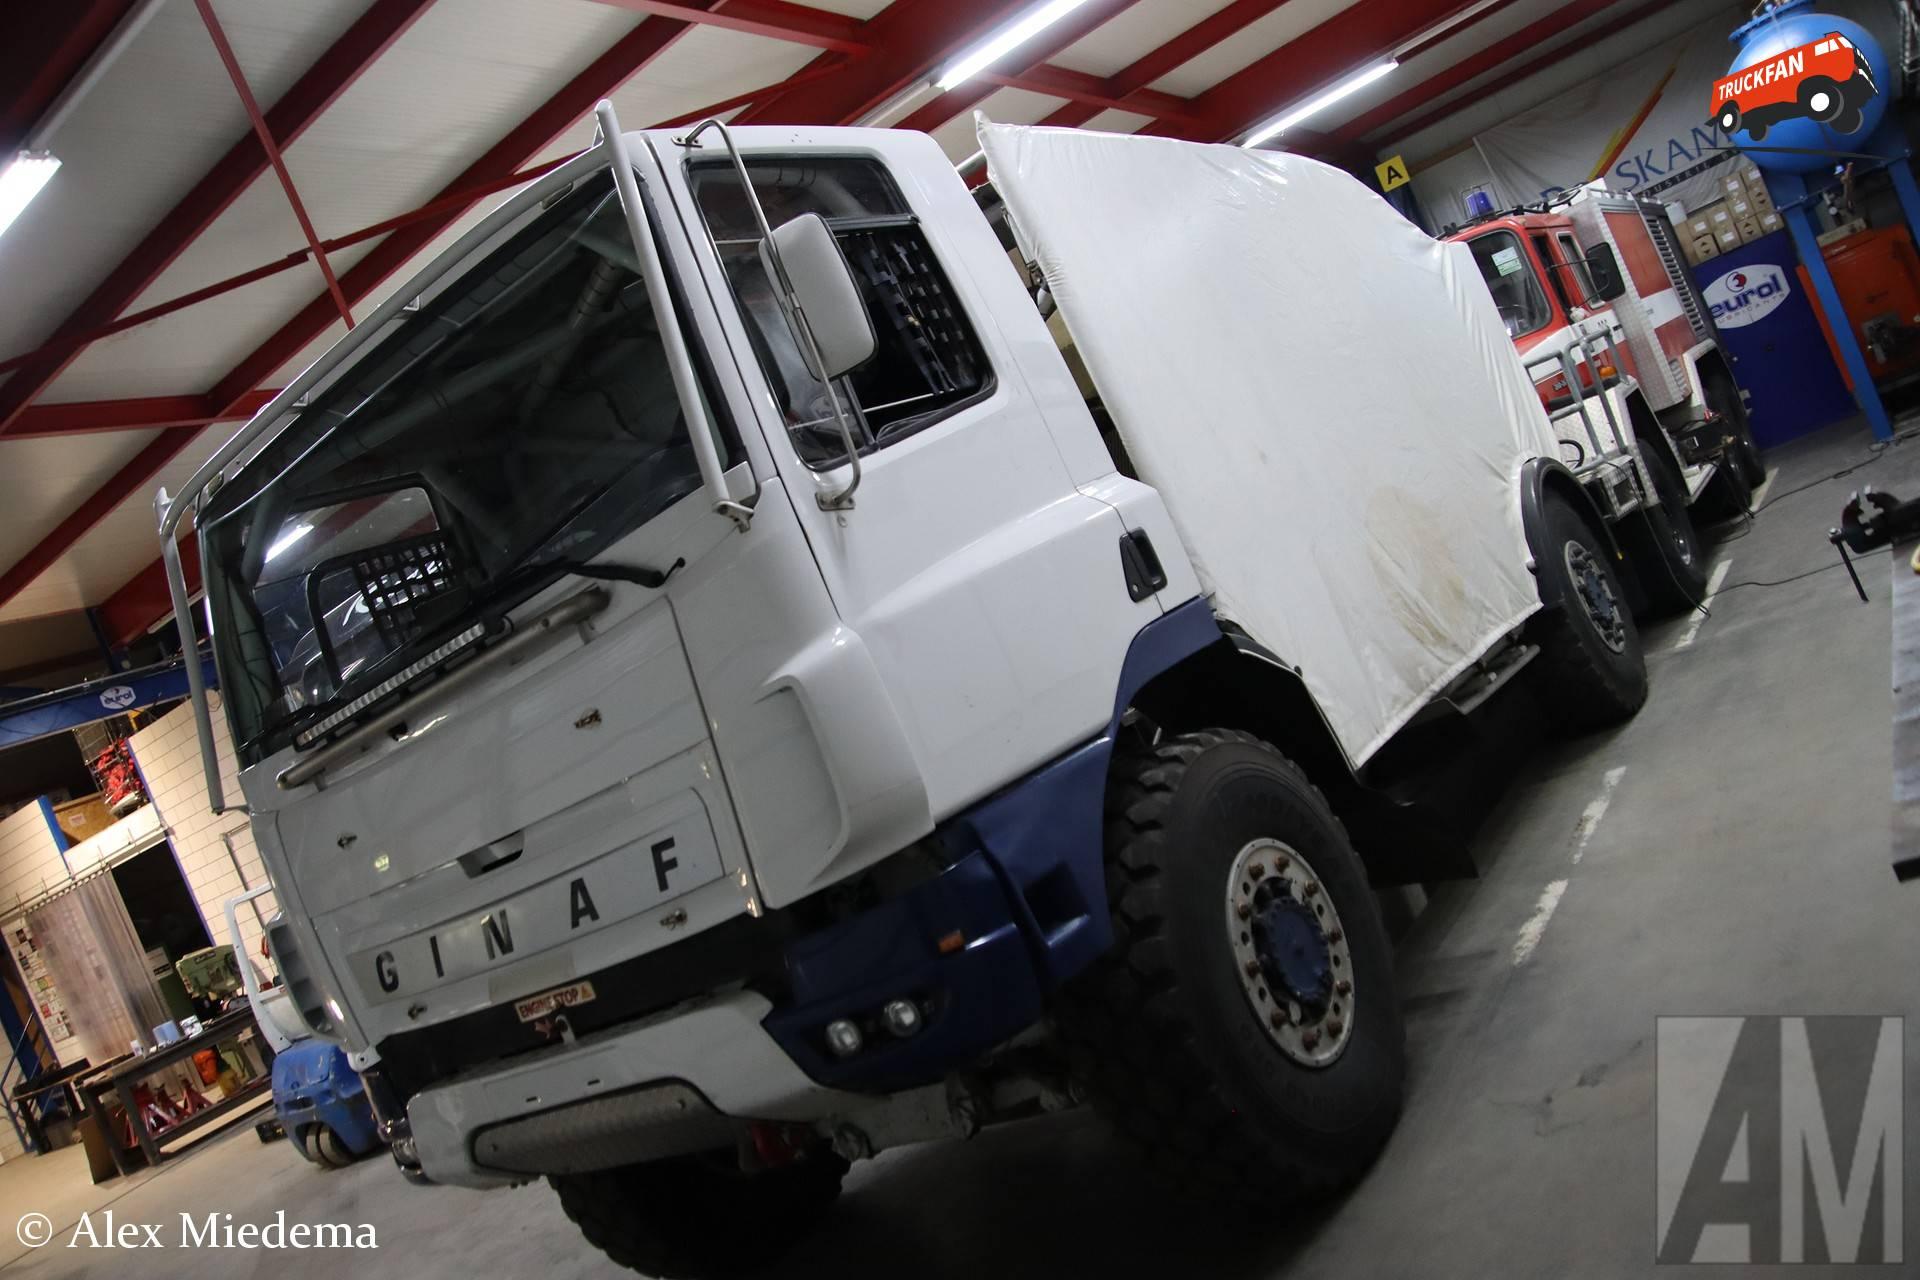 GINAF X2222